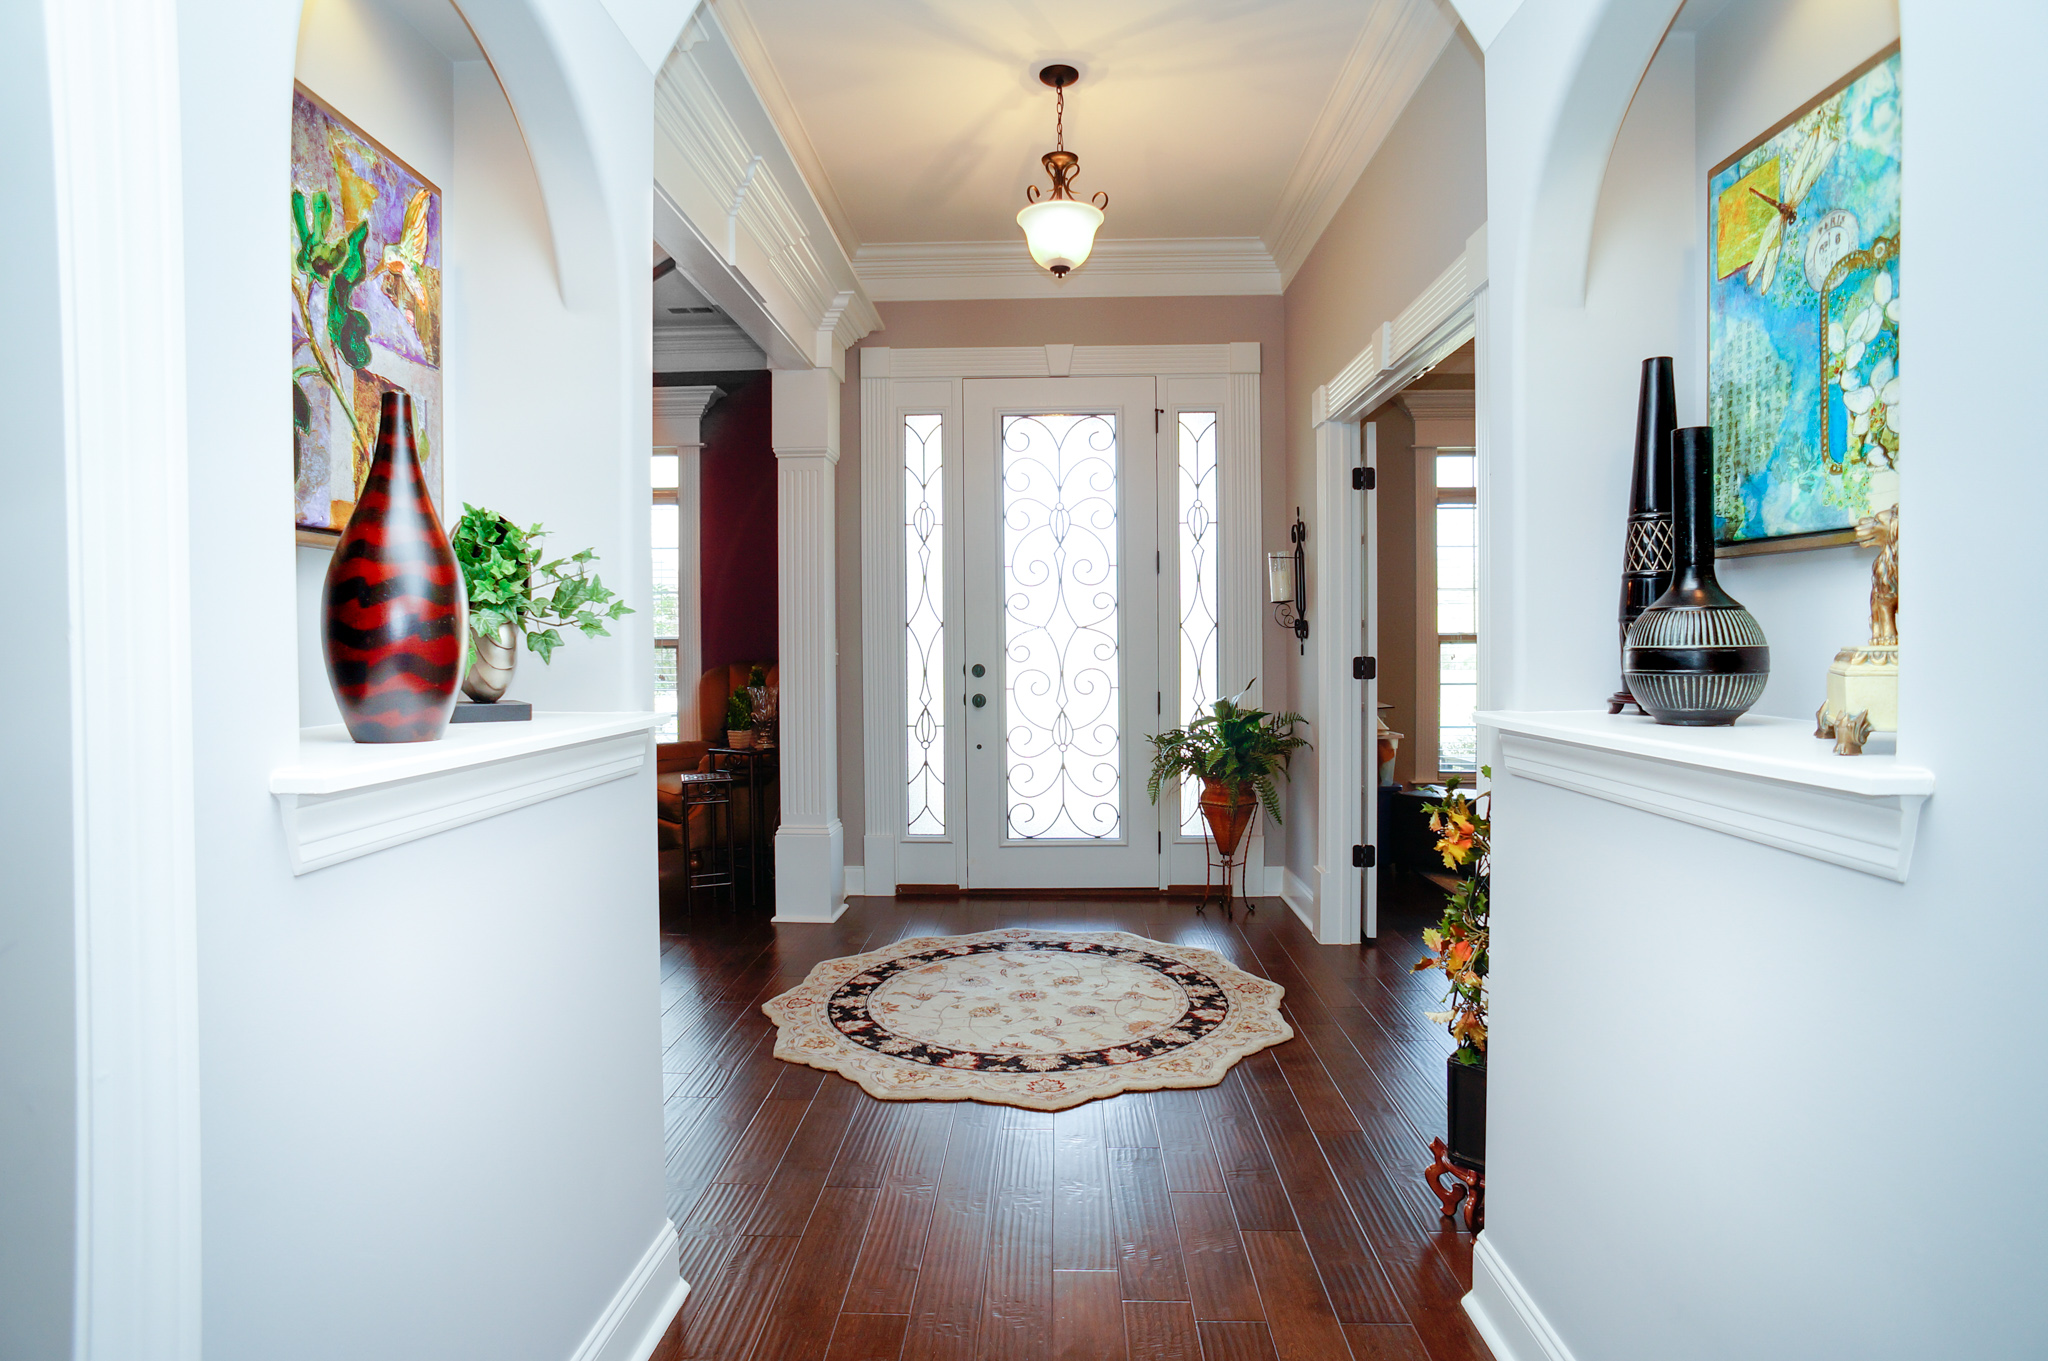 Interiors08.jpg